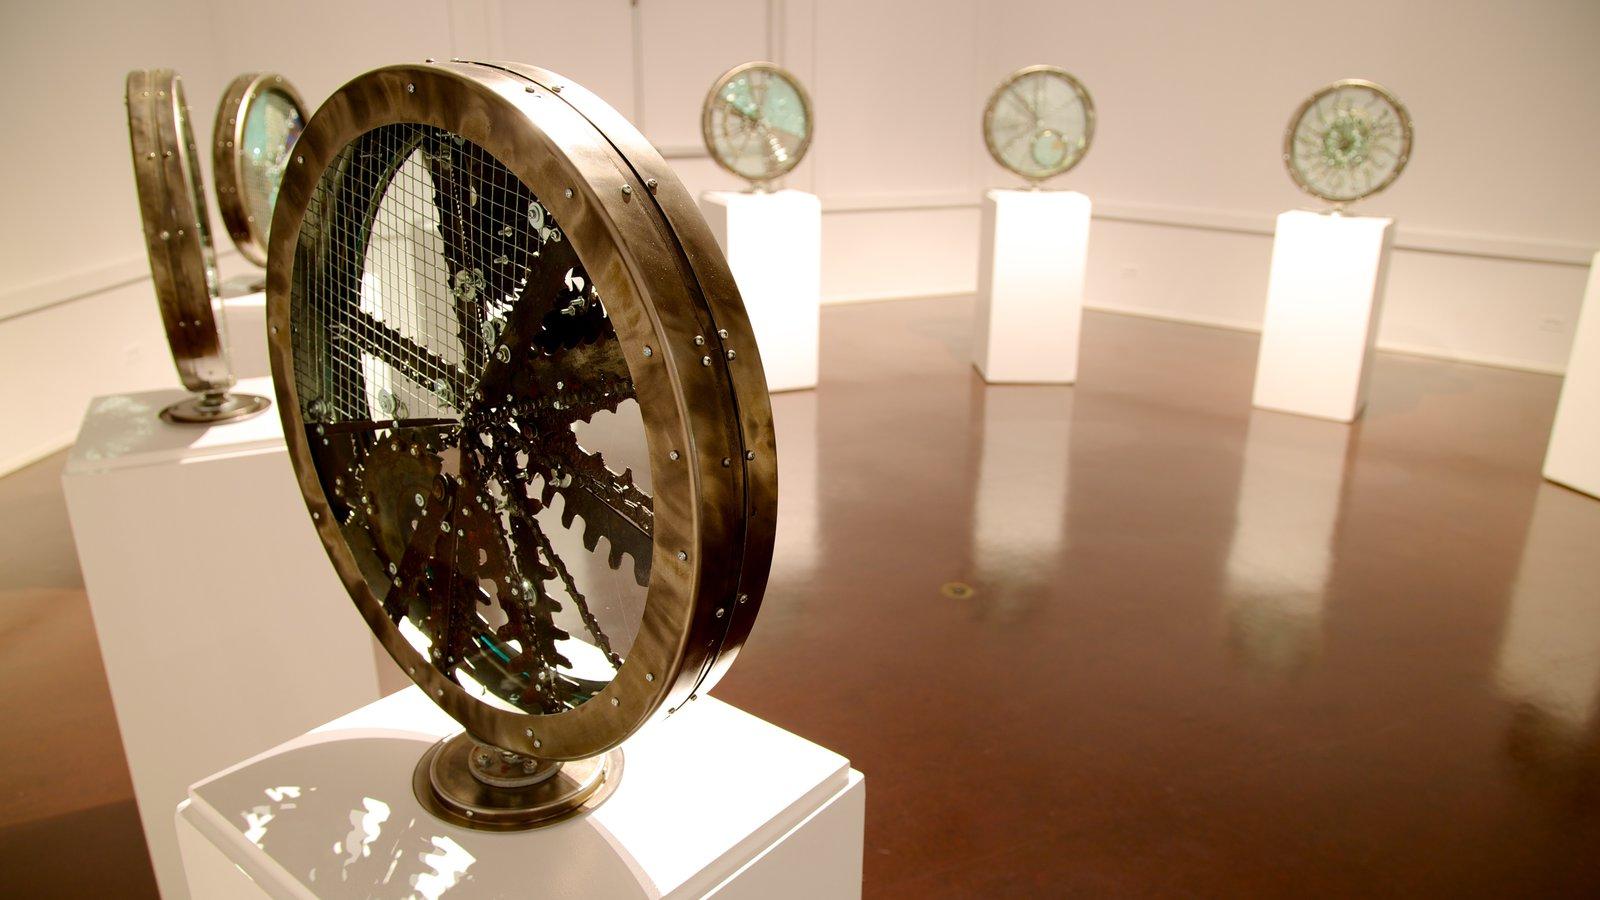 Kootenay Gallery showing interior views and art